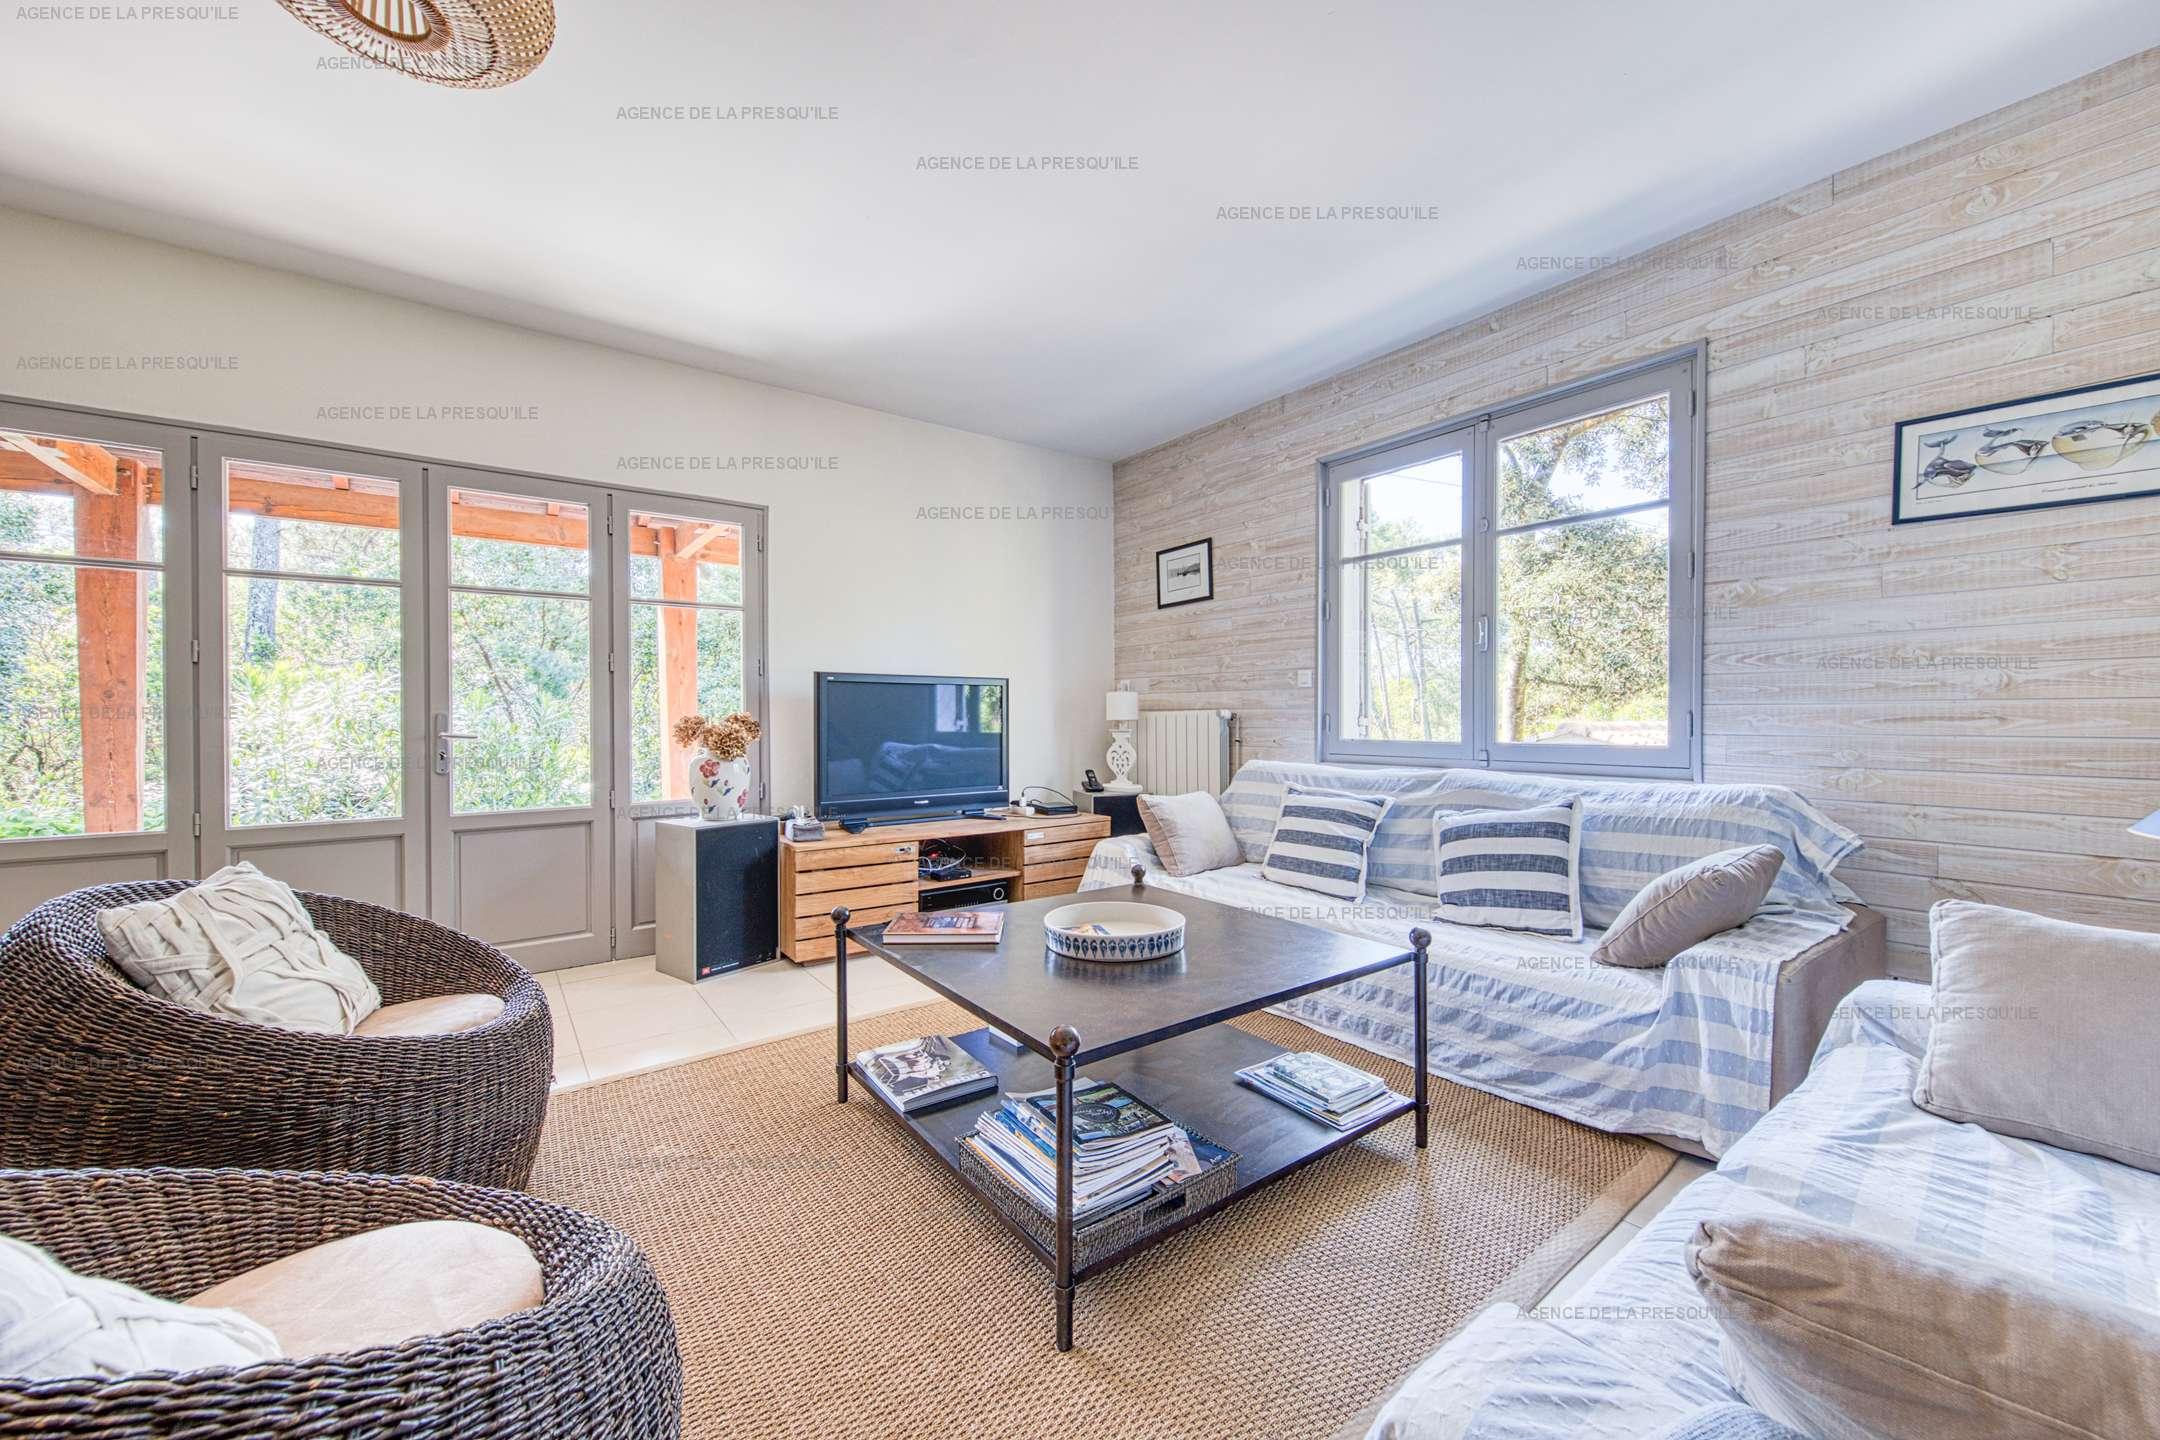 Location: Charmante villa avec piscine entre bassin et océan 3